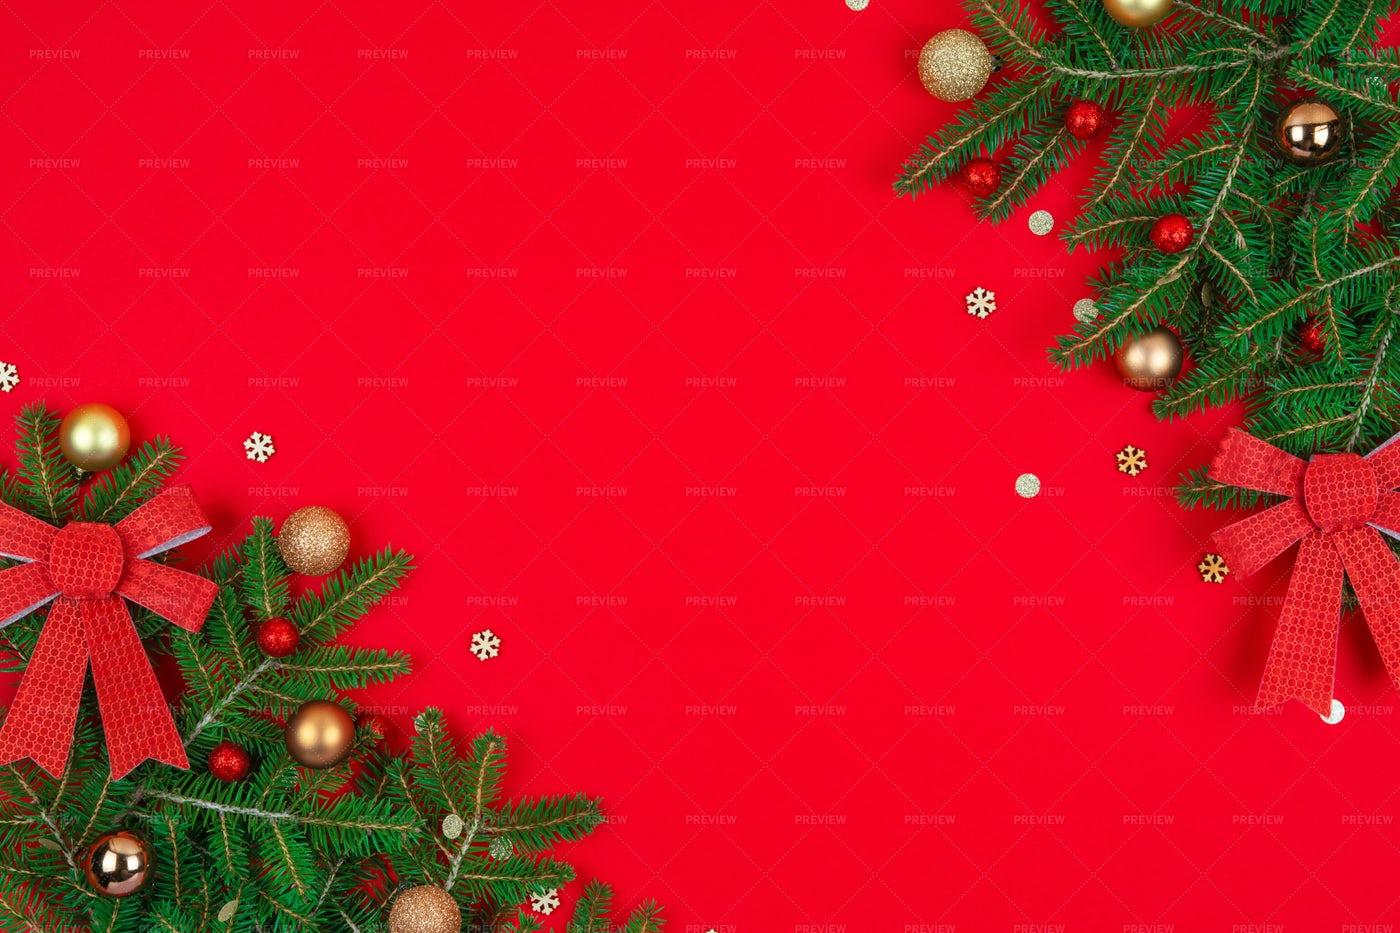 Christmas Card: Stock Photos